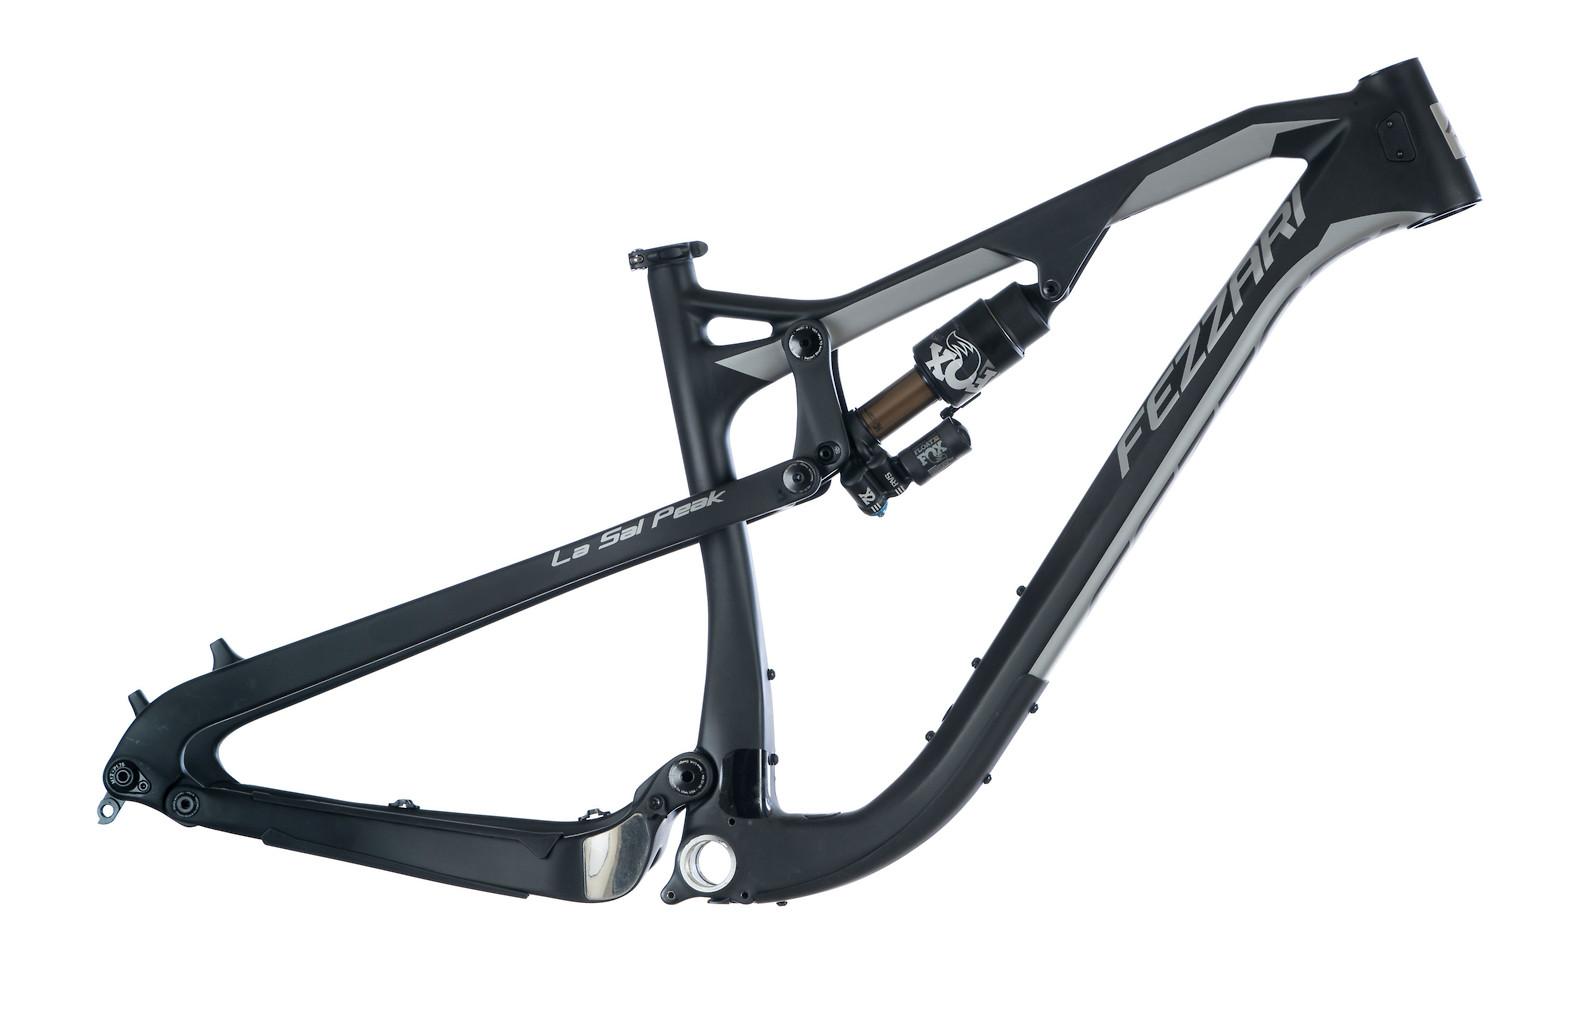 Fezzari La Sal Peak Frame (2020/2021, Raw Carbon and Silver)